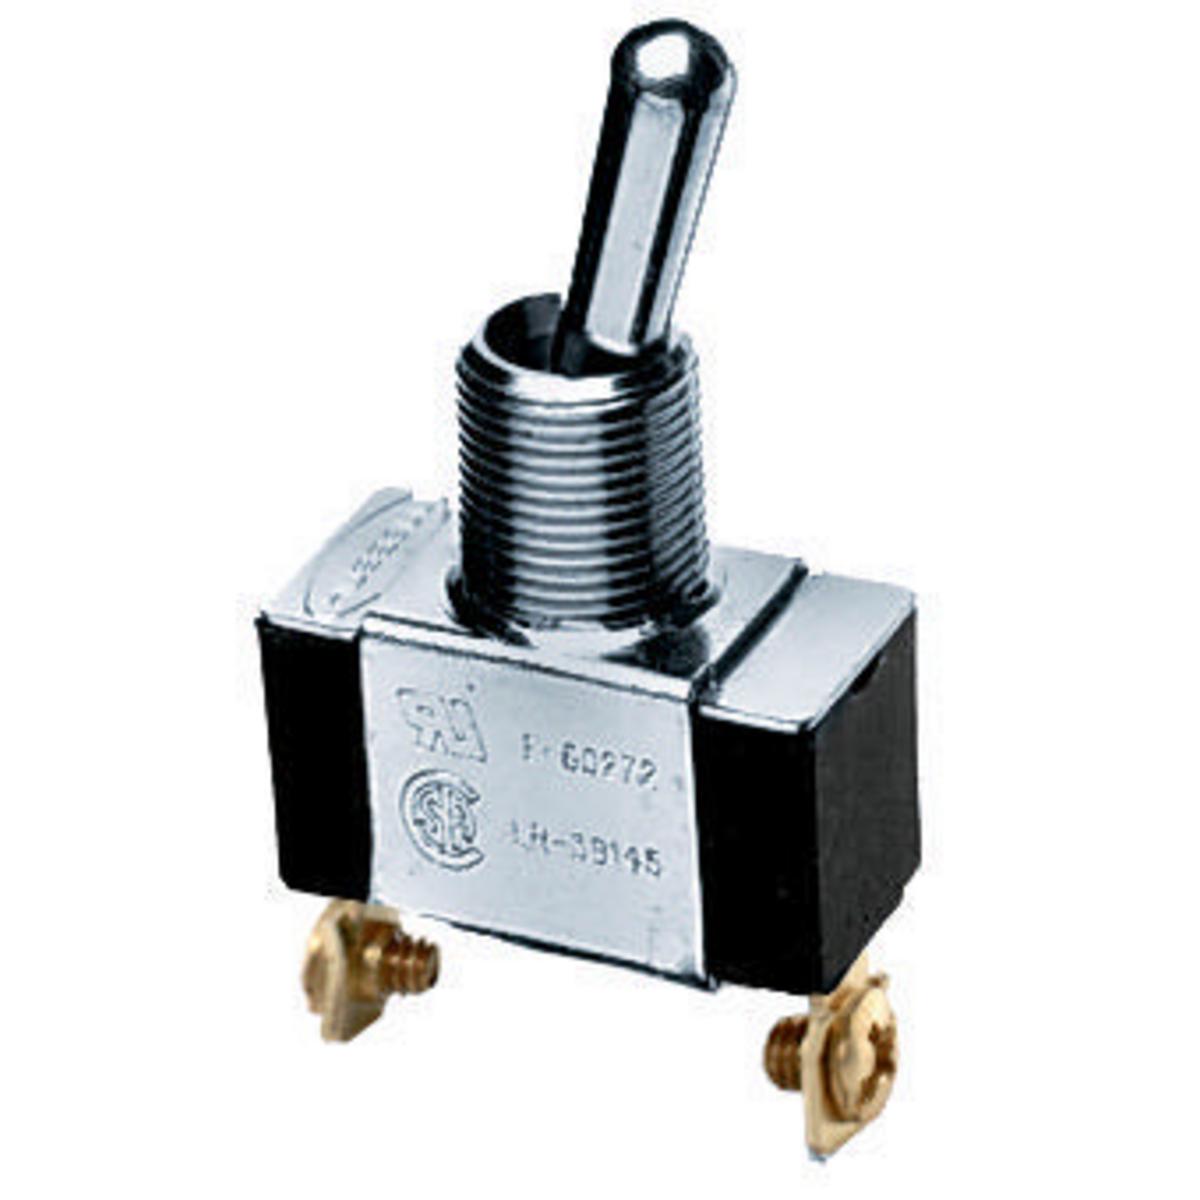 Hubbell HBL11 3/4 Hp 10 Amp 250 VAC SPST Panel Mount Screw Terminal Bat Handle Heavy Duty Switch